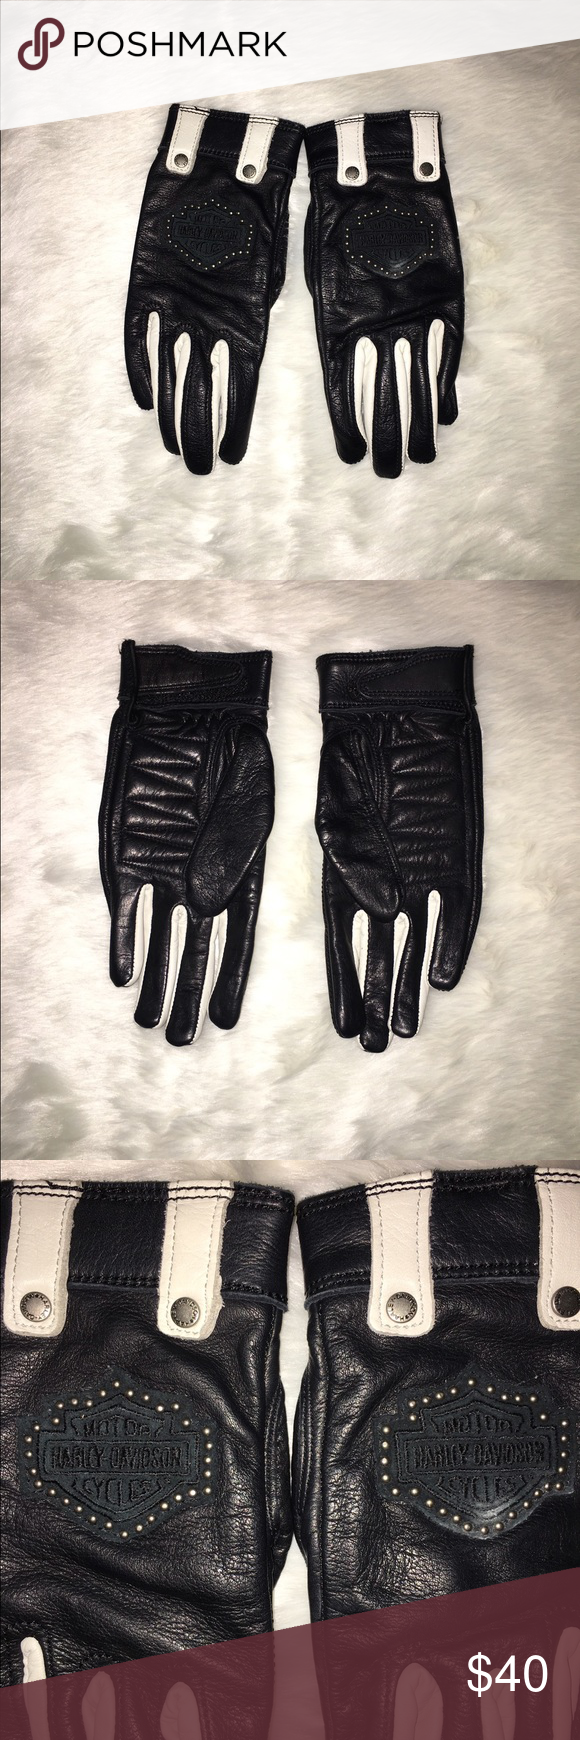 Xs black leather gloves - Harley Davidson Leather Gloves